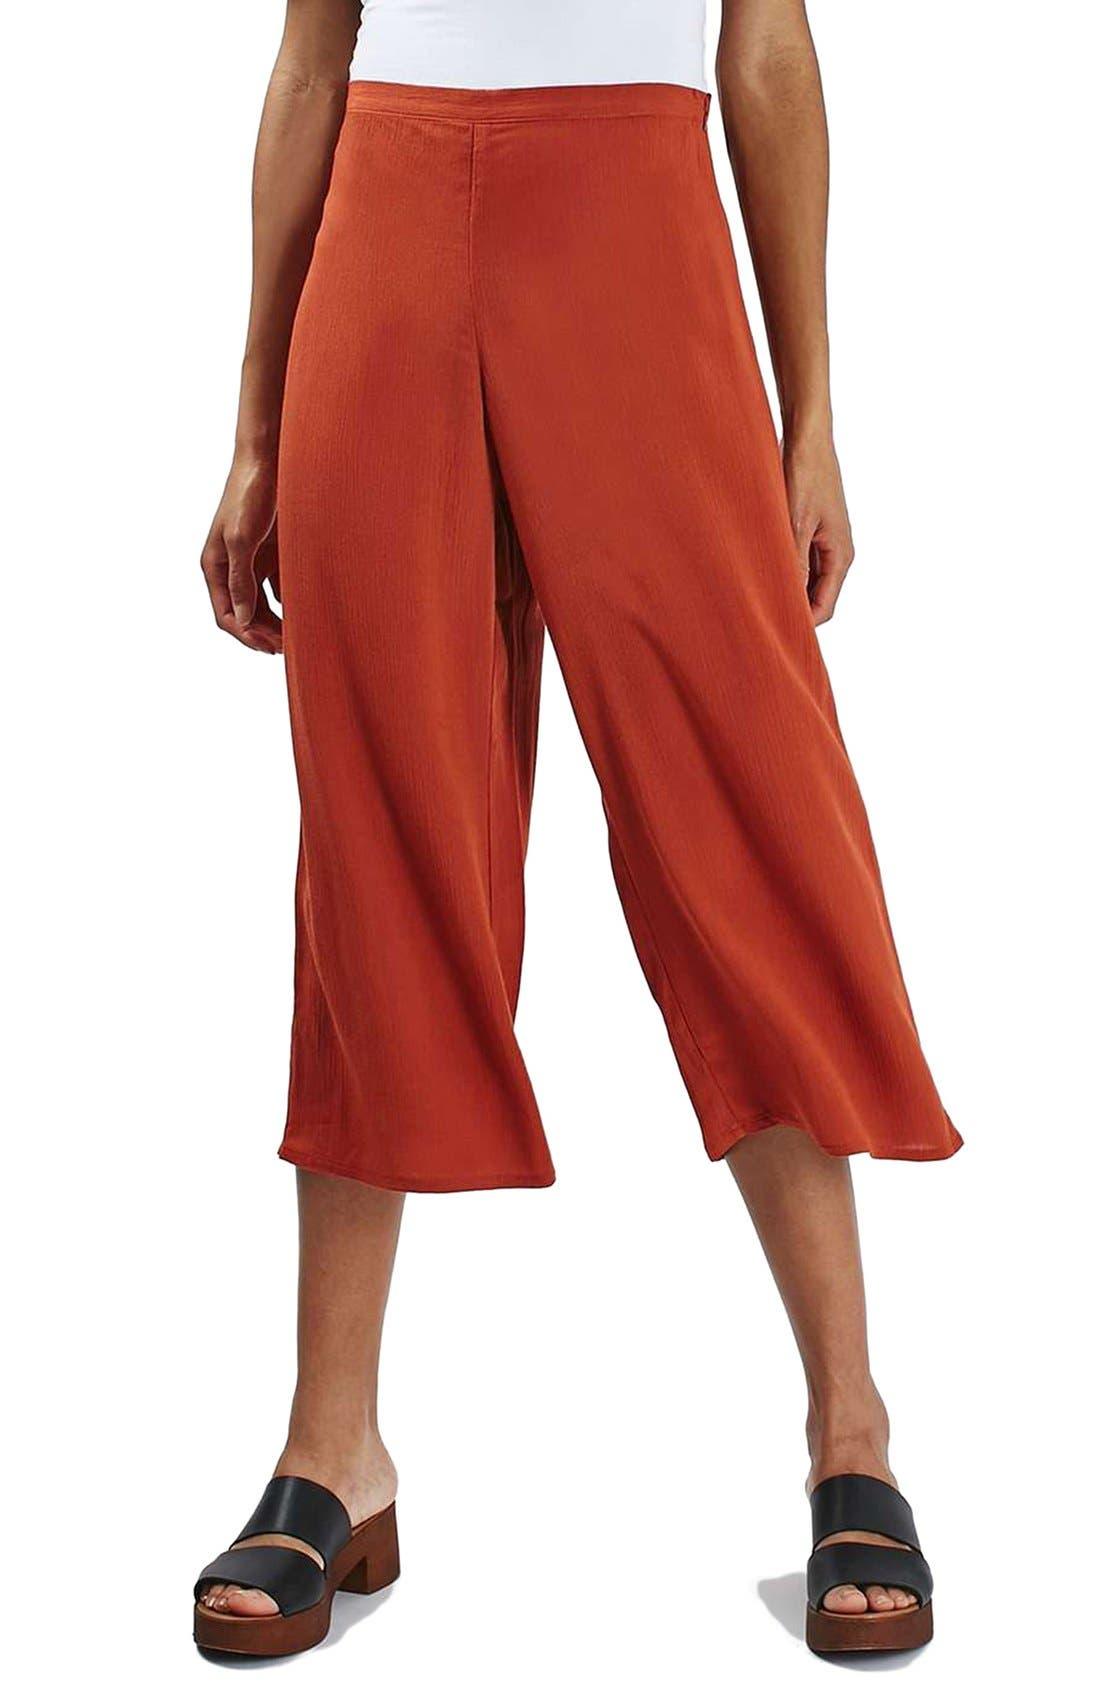 Alternate Image 1 Selected - Topshop Crinkled Crop Wide Leg Trousers